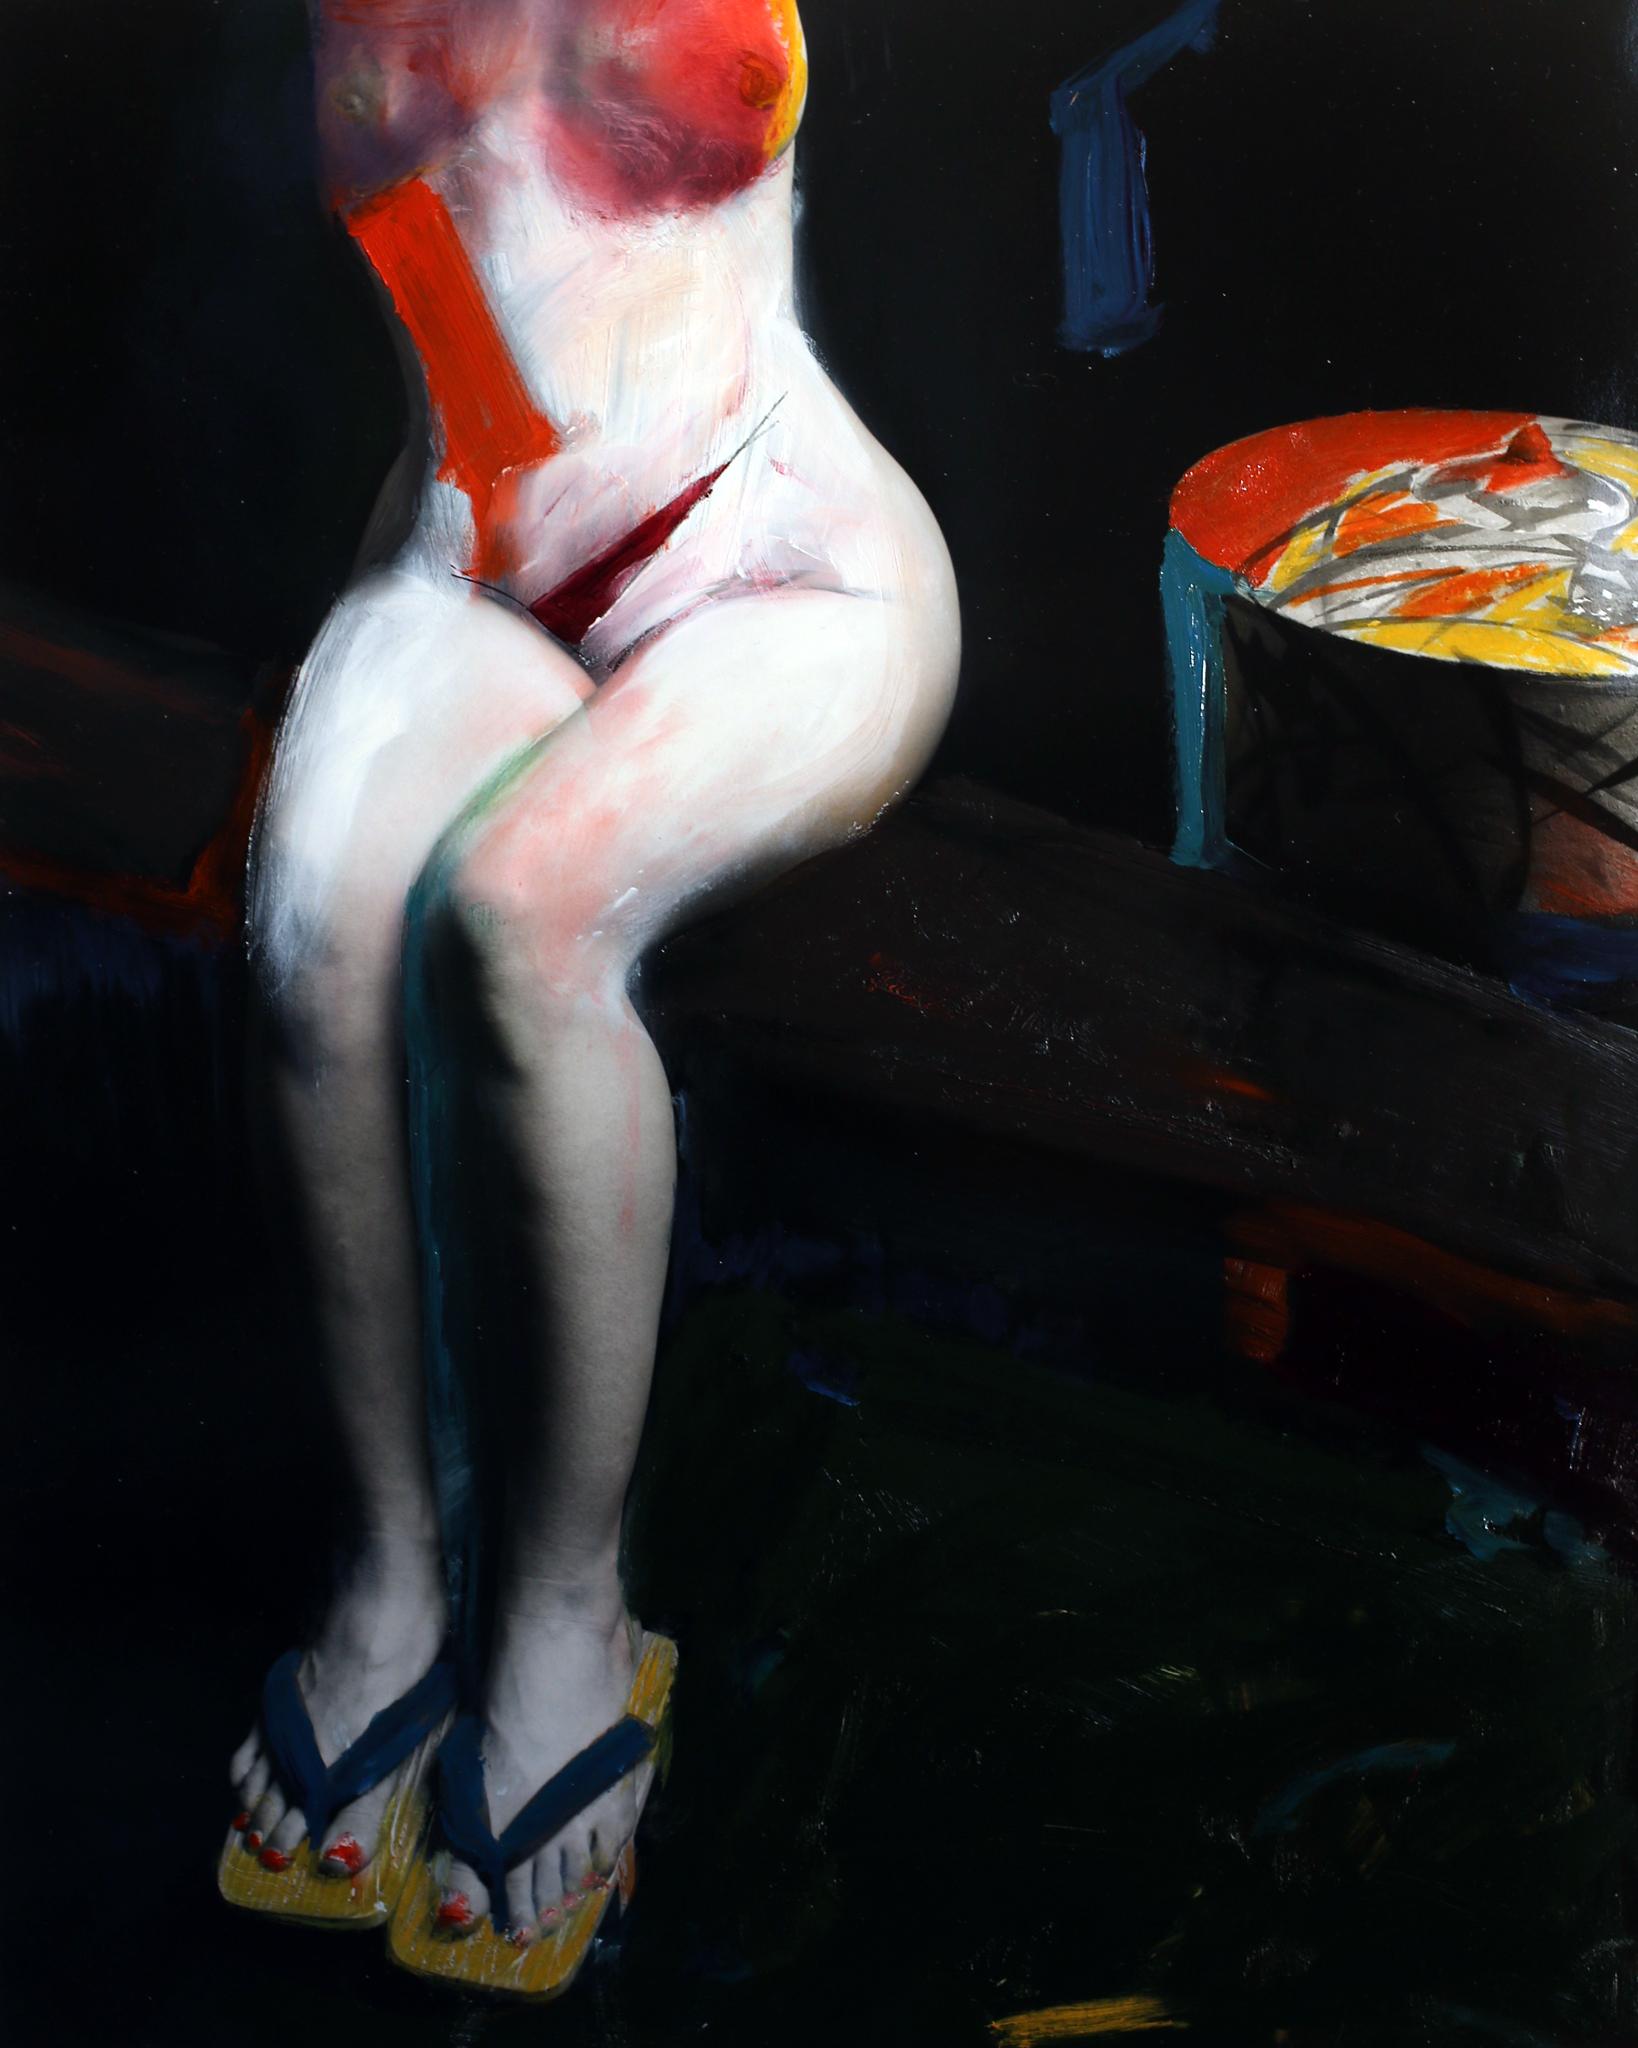 Kim-Weston-Painted-16x20-6.jpg